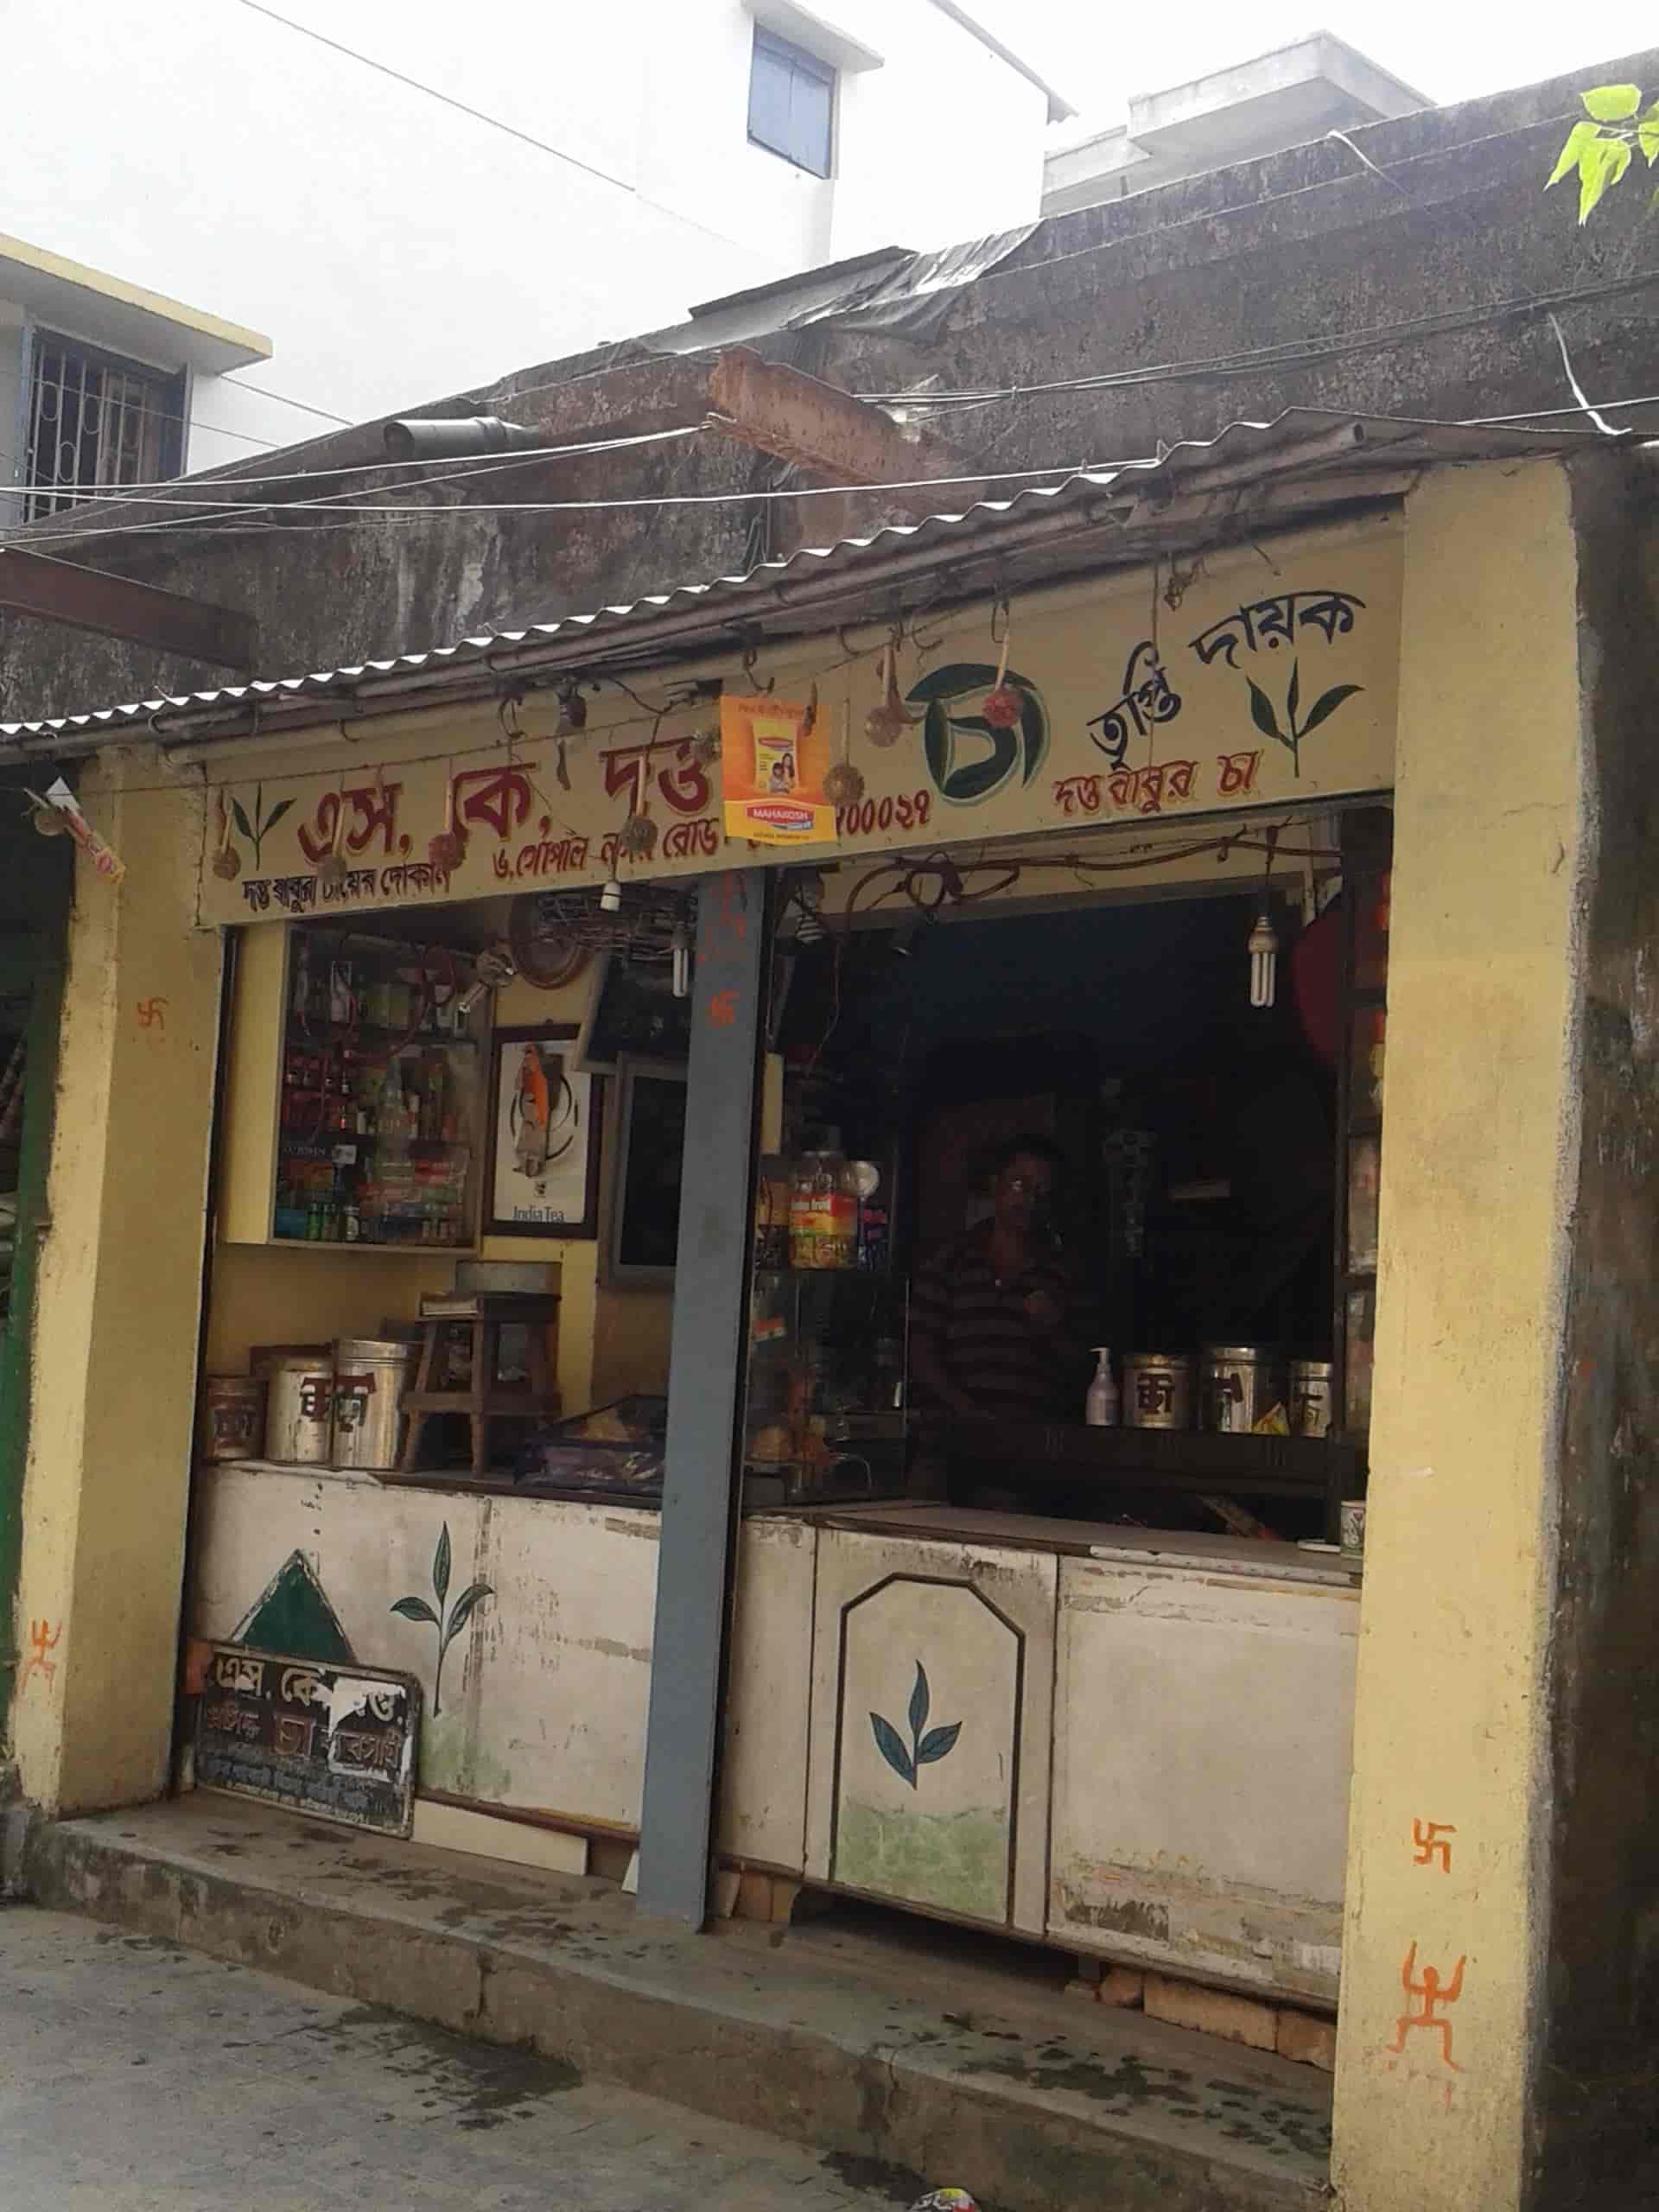 S K Datta Stores, Alipore - Tea Leaf Retailers in Kolkata - Justdial